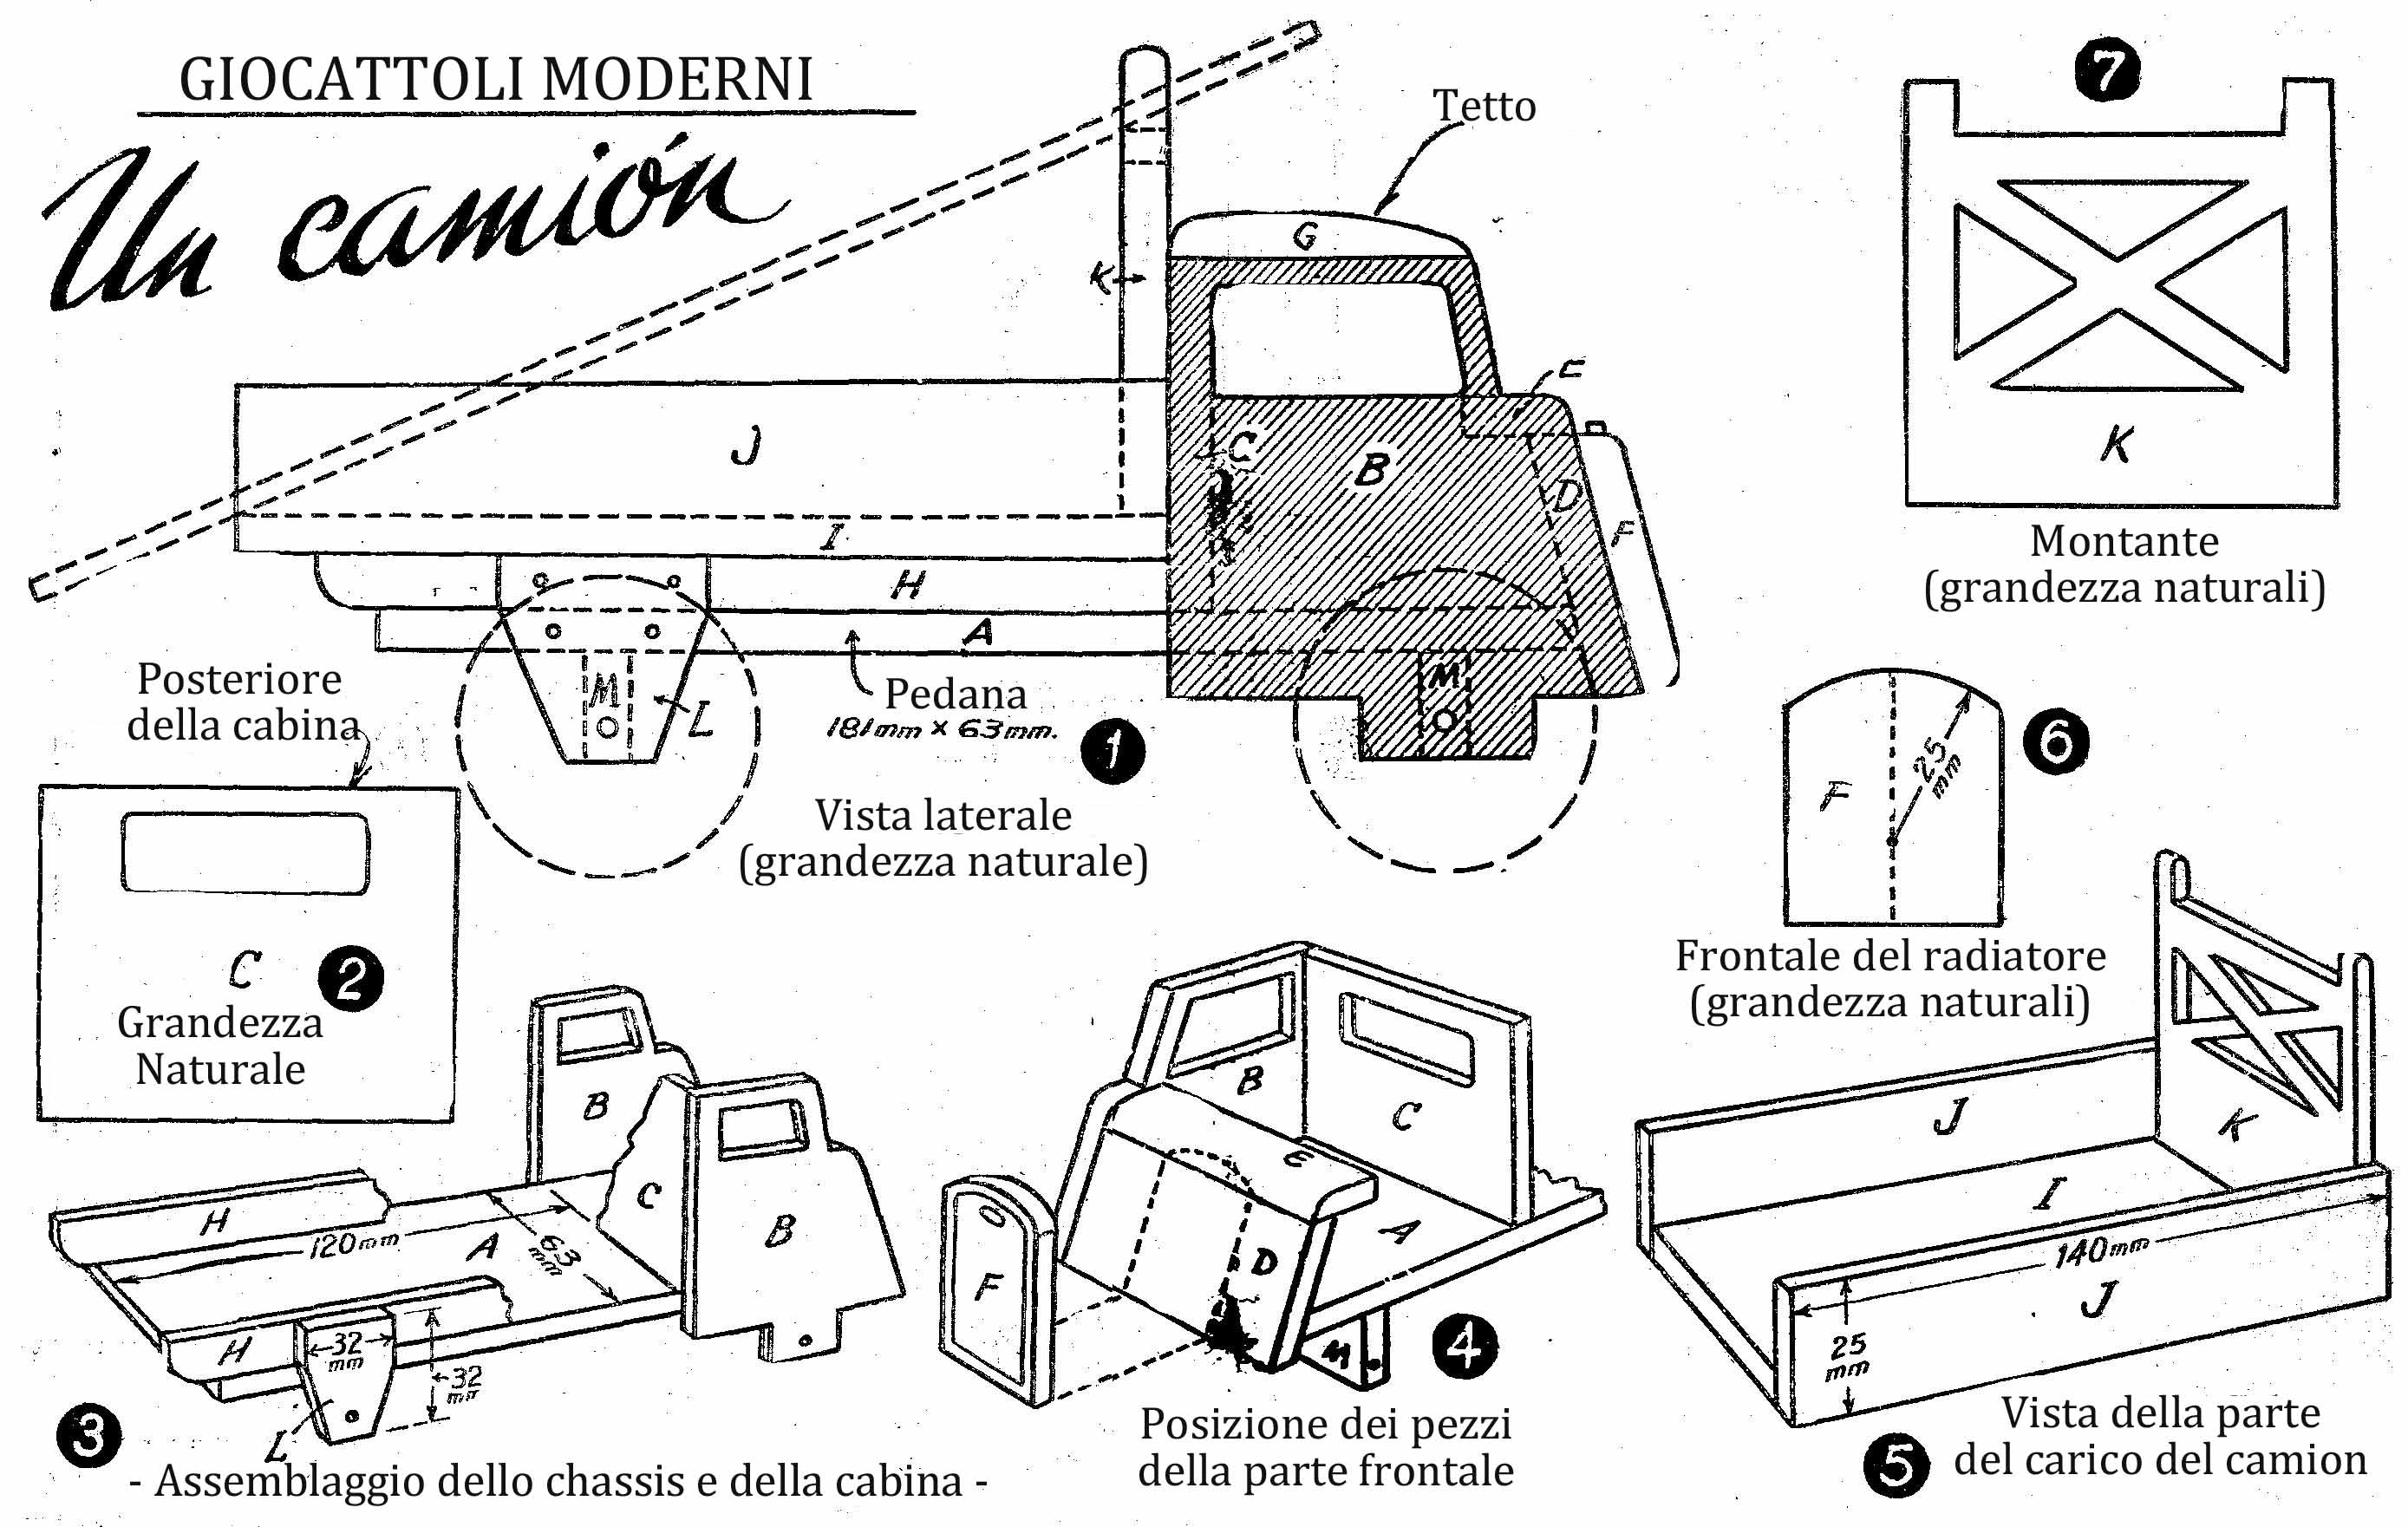 costruire giocattoli in legno dx99 regardsdefemmes. Black Bedroom Furniture Sets. Home Design Ideas